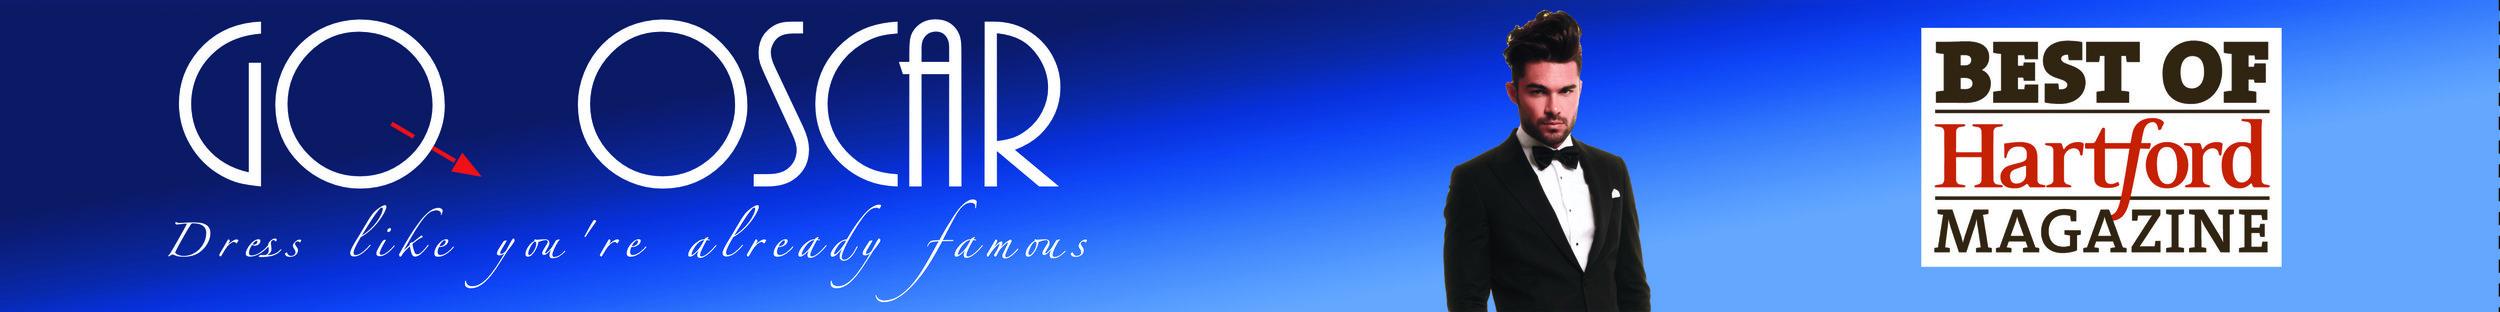 stripBlue.jpg